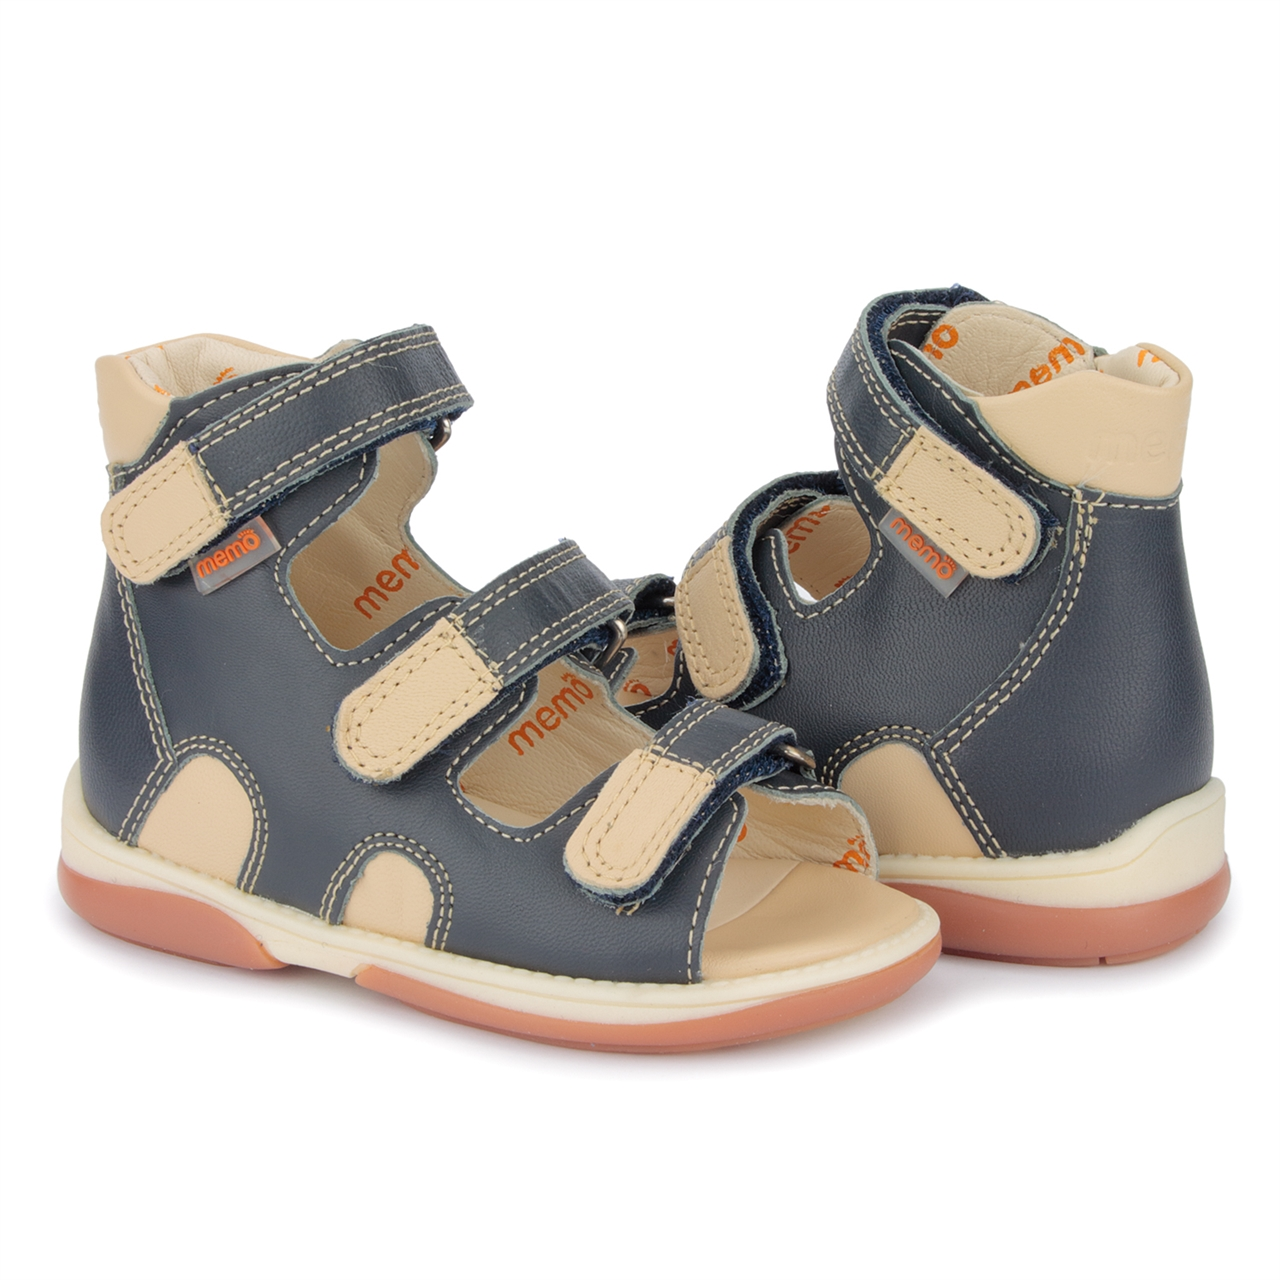 1c08c459d7a7 Picture of Memo Apollo 3DA Black Toddler Boy Orthopedic Velcro Sandal ...